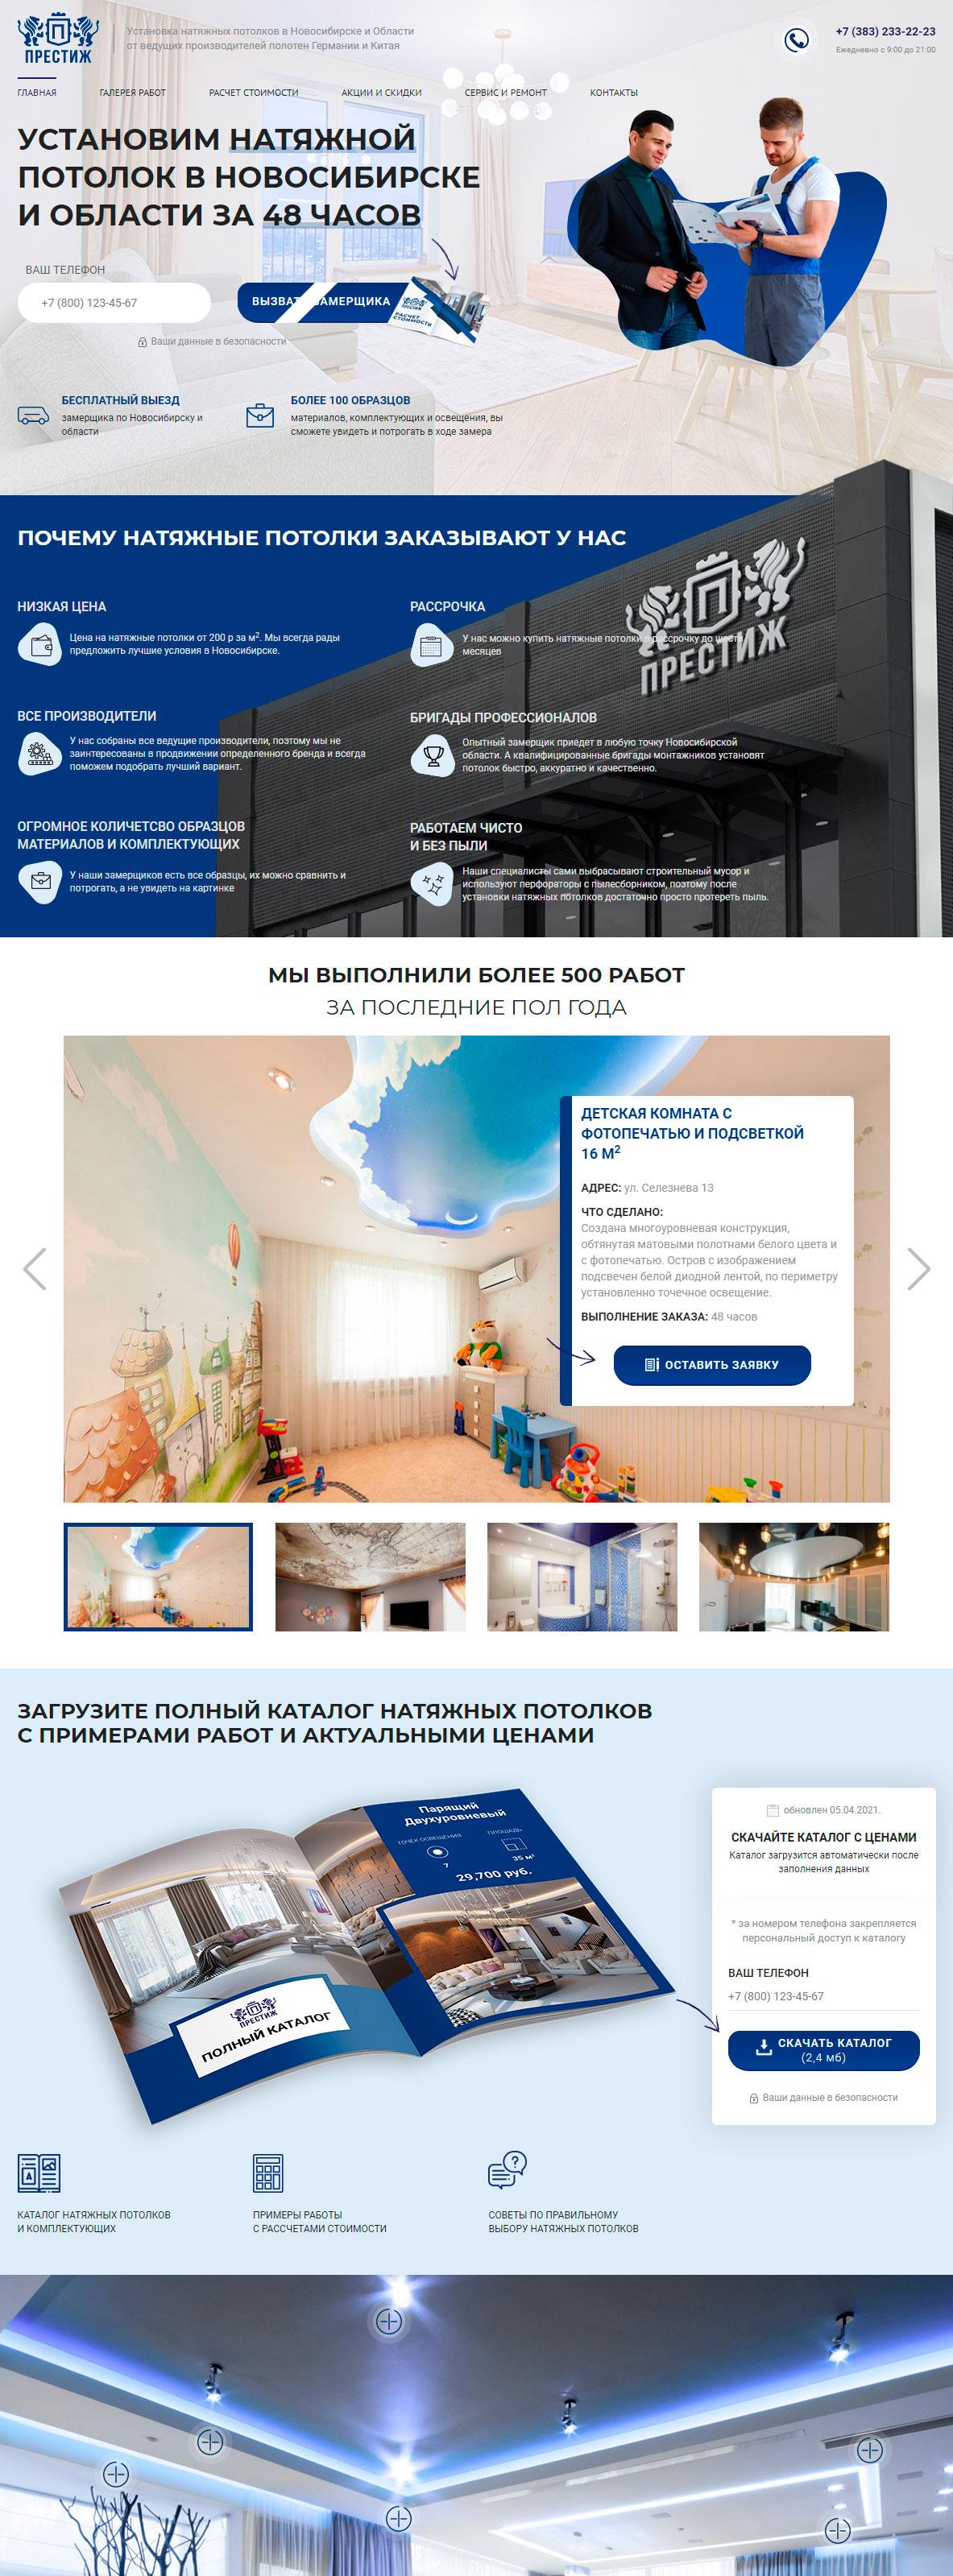 Сайт-визитка potolki54.ru